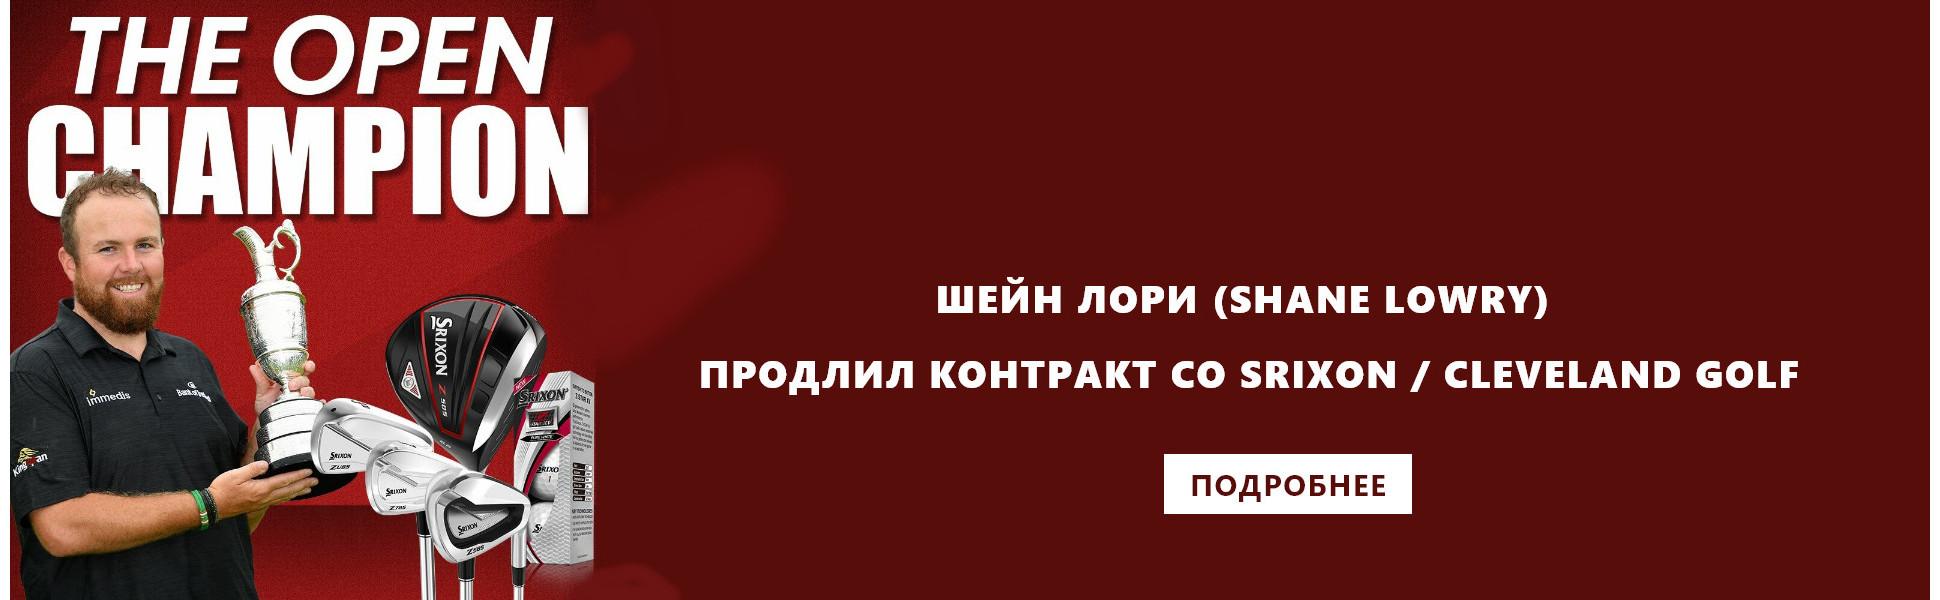 ШЕЙН ЛОРИ